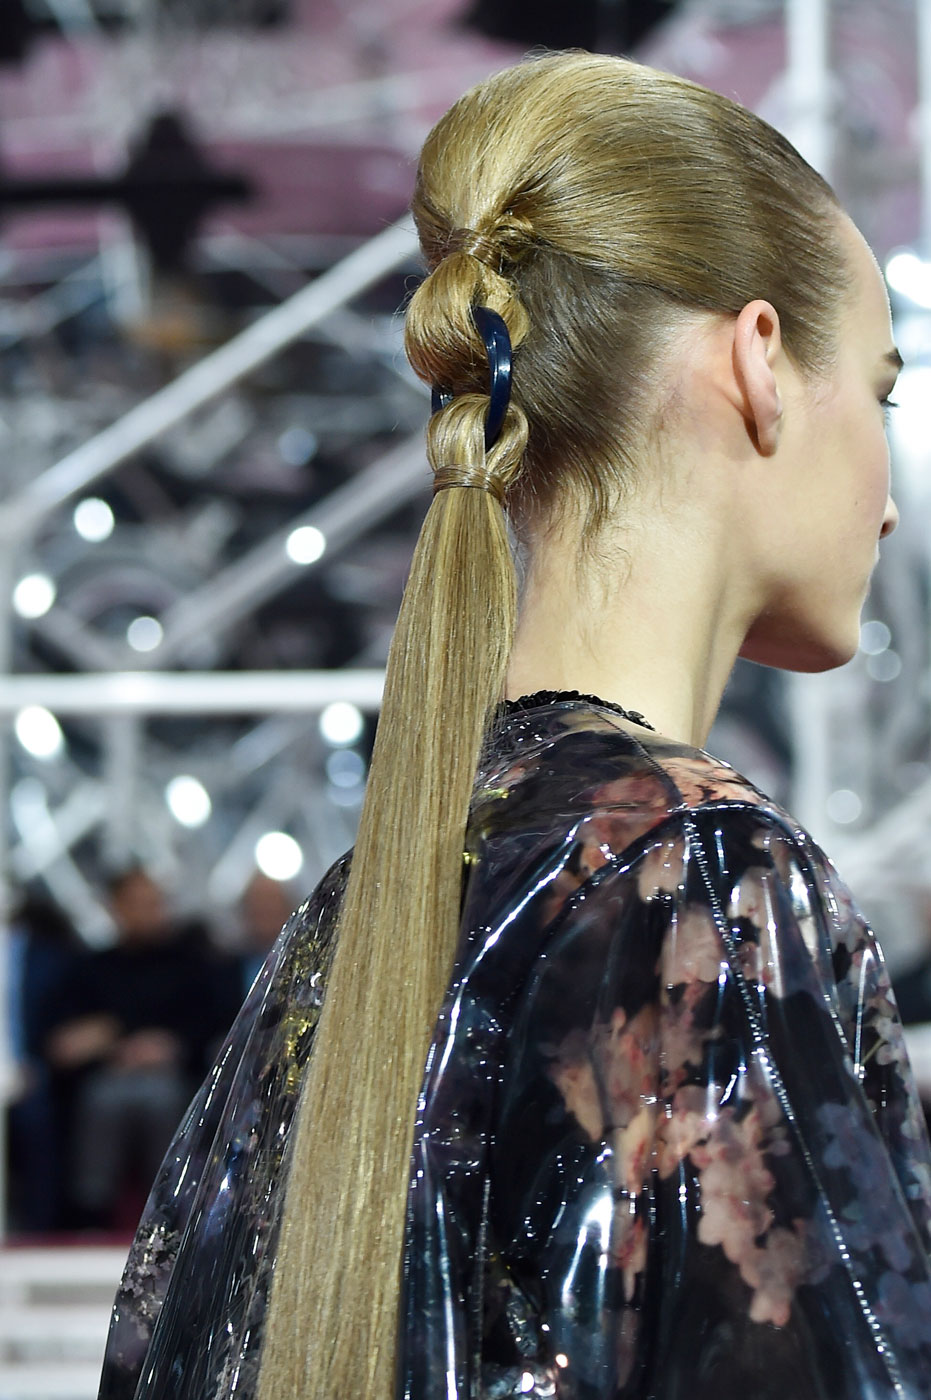 Christian-Dior-fashion-runway-show-close-ups-haute-couture-paris-spring-summer-2015-the-impression-007